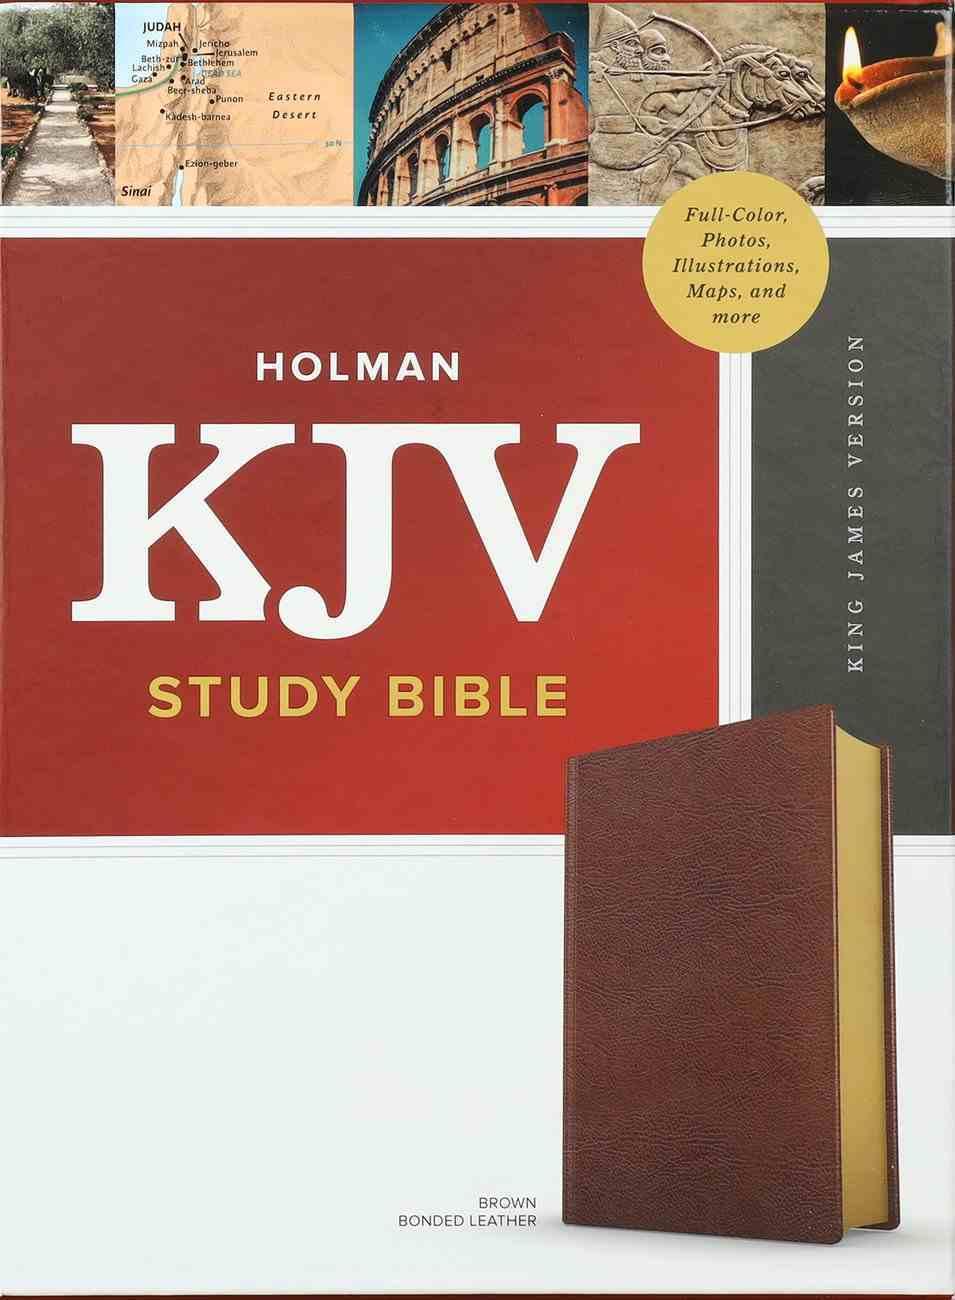 KJV Study Bible Full-Color Brown Bonded Leather